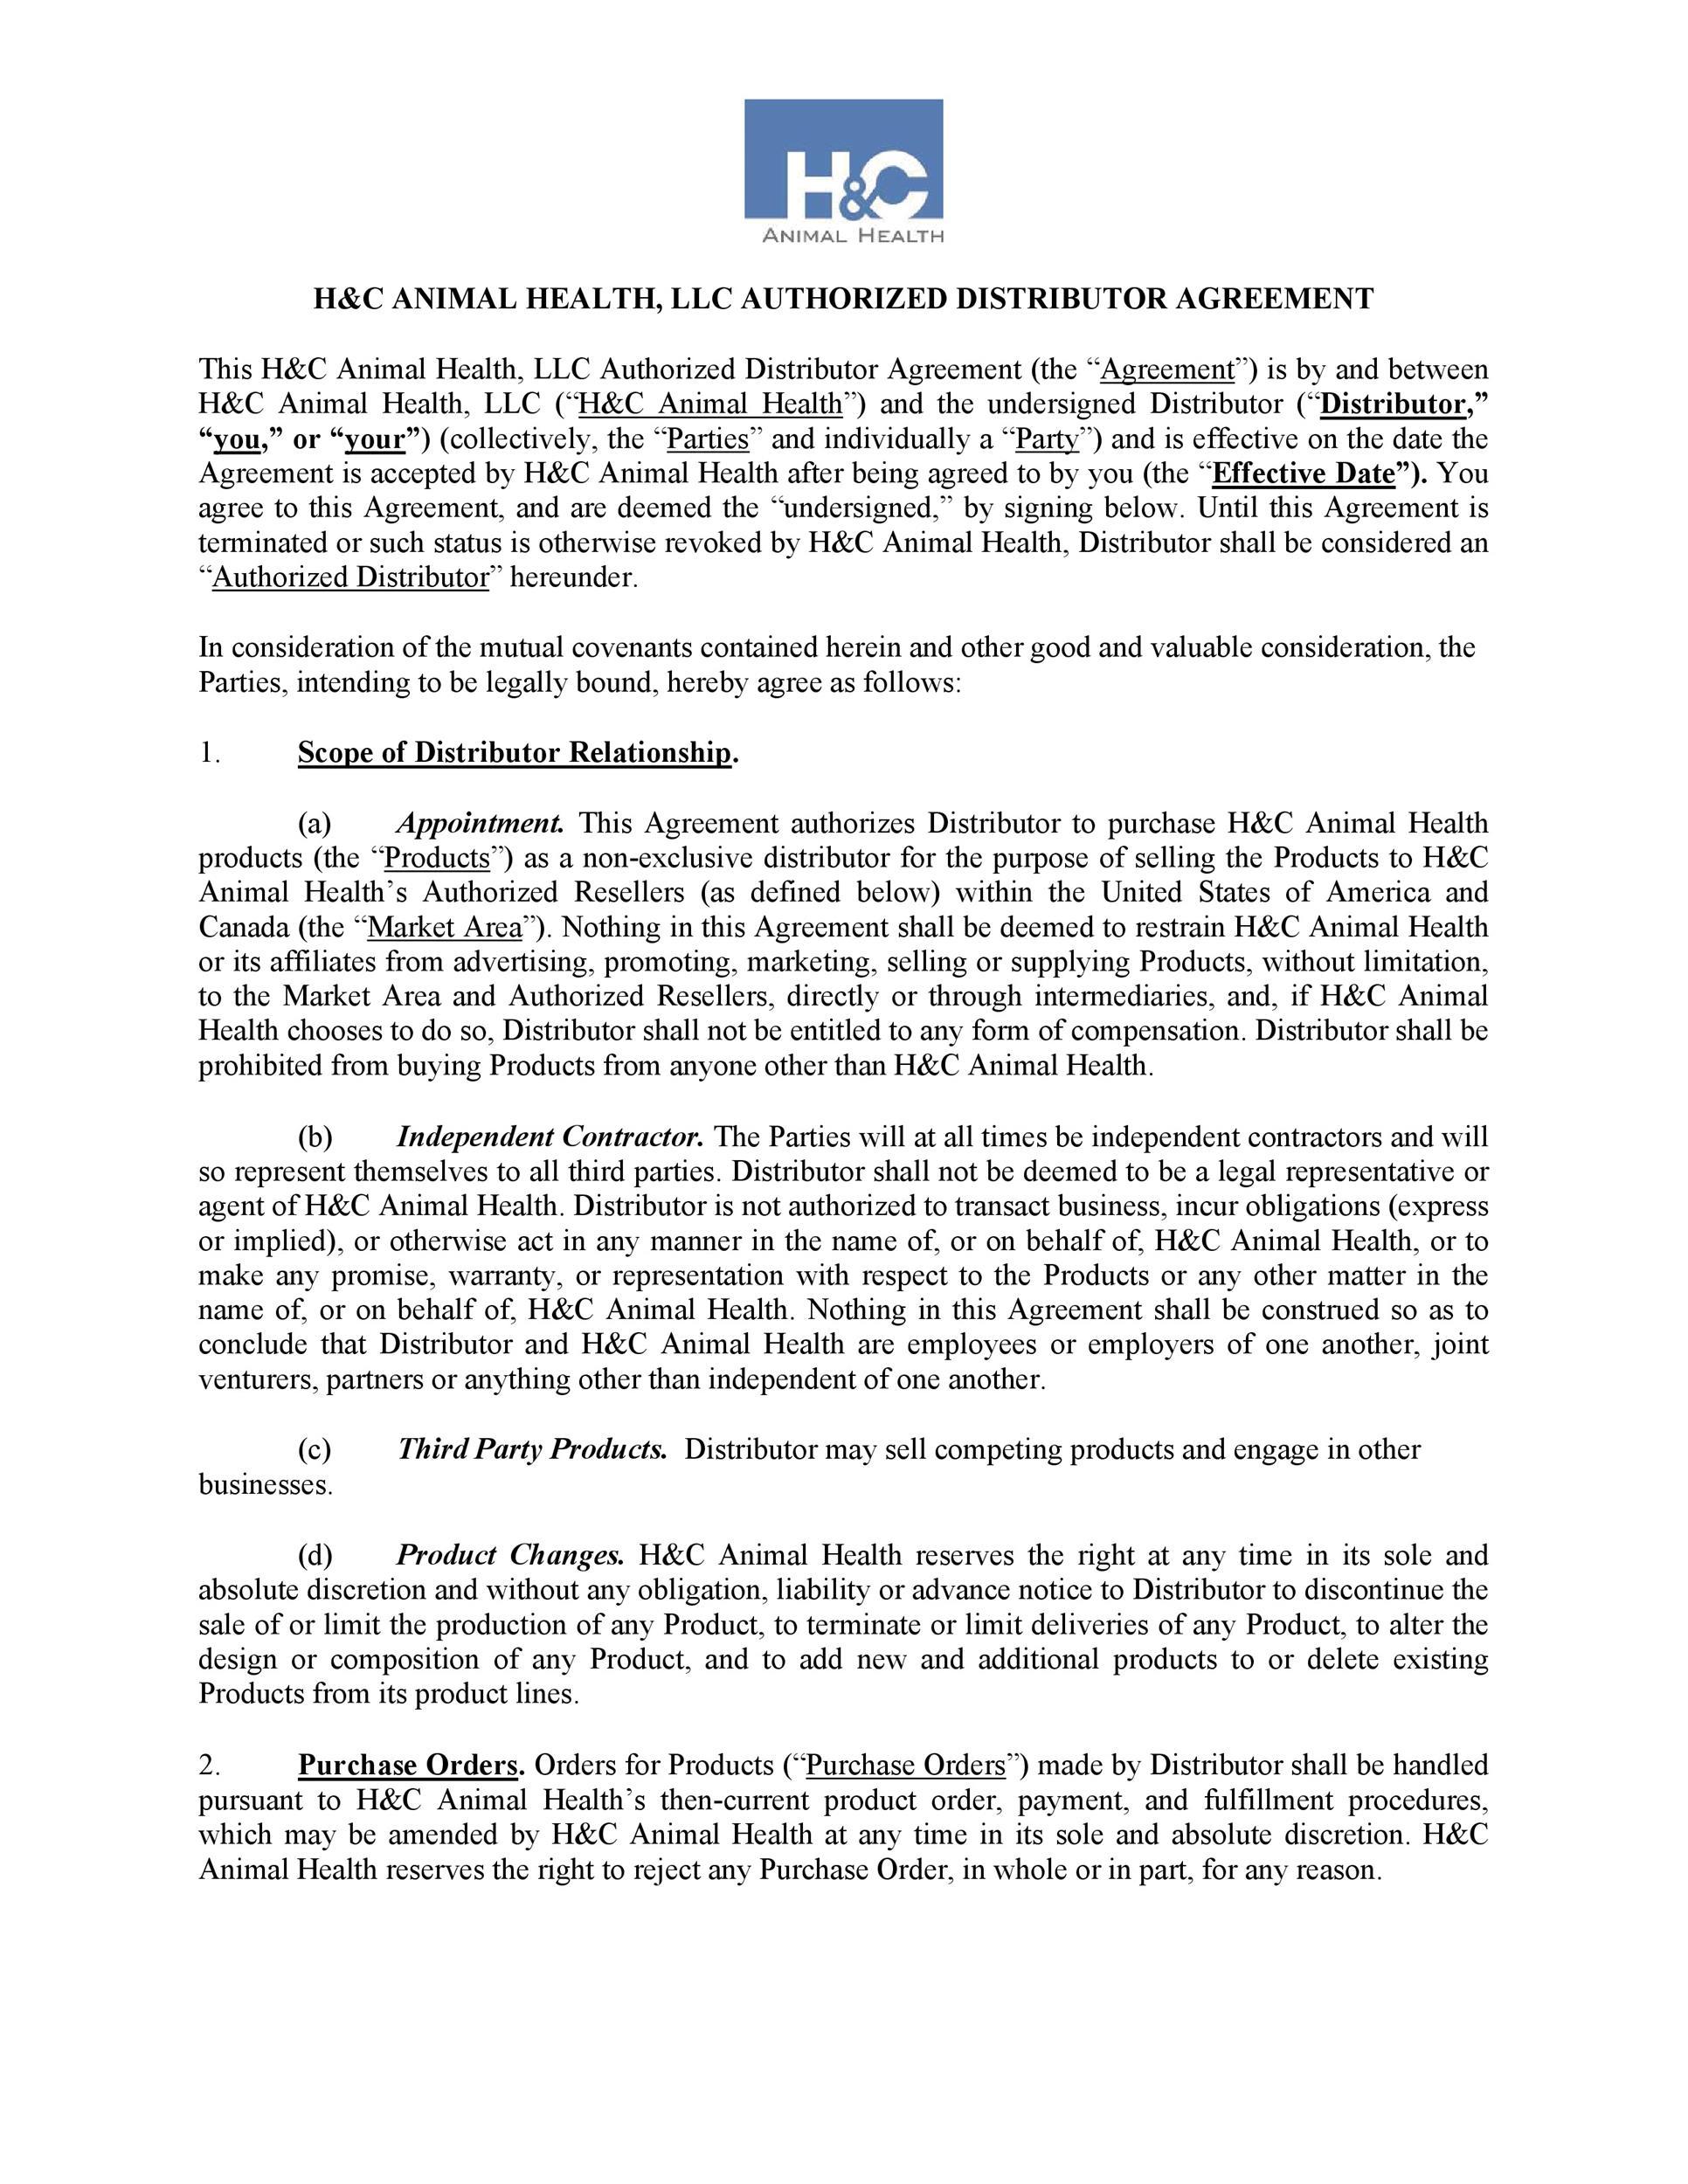 Free distribution agreement 33